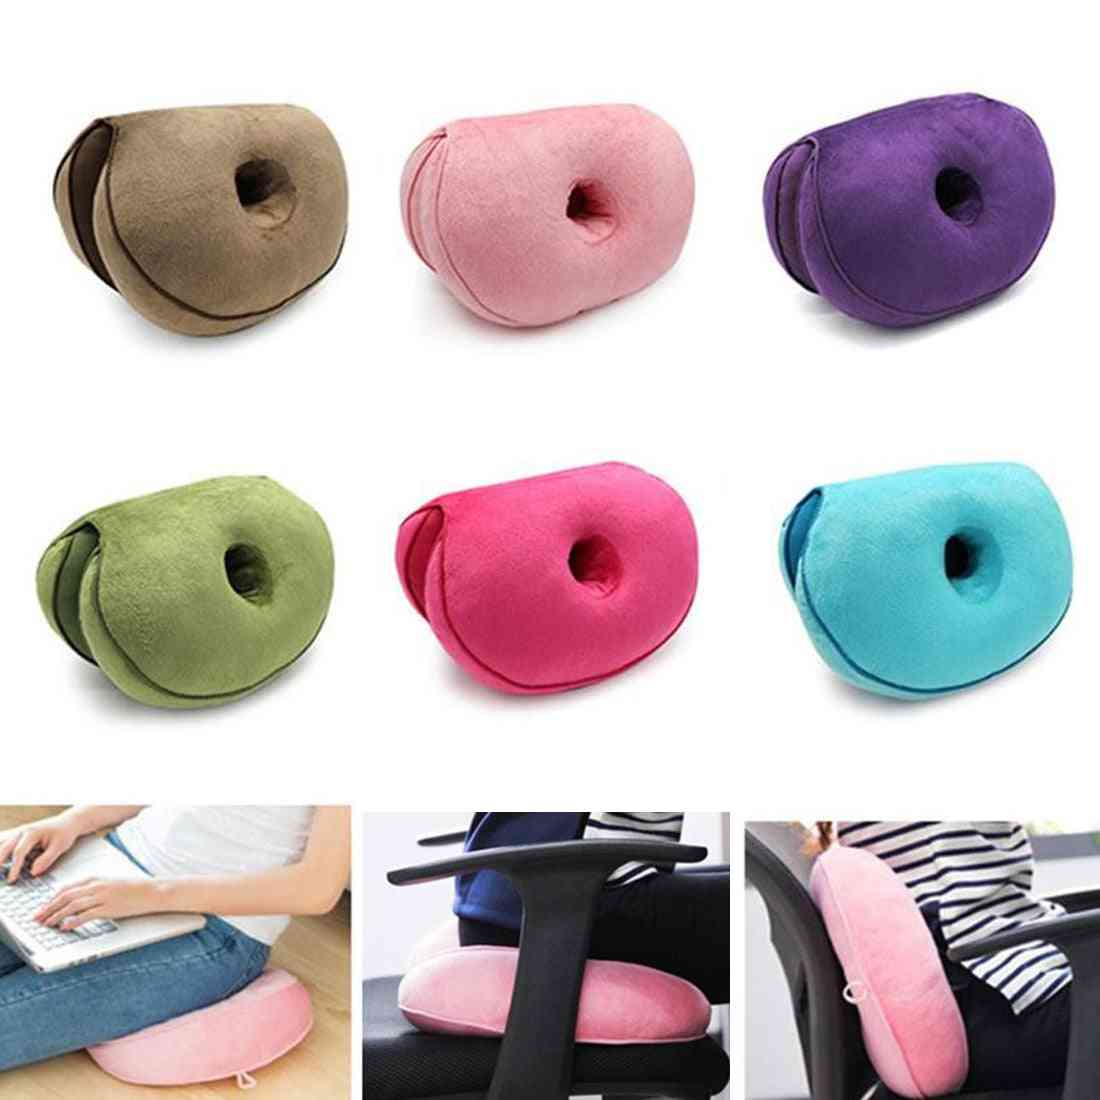 Dual Comfort Cushion- Hip Shape Folding Pillow Fits Car Seat, Home/office Chair